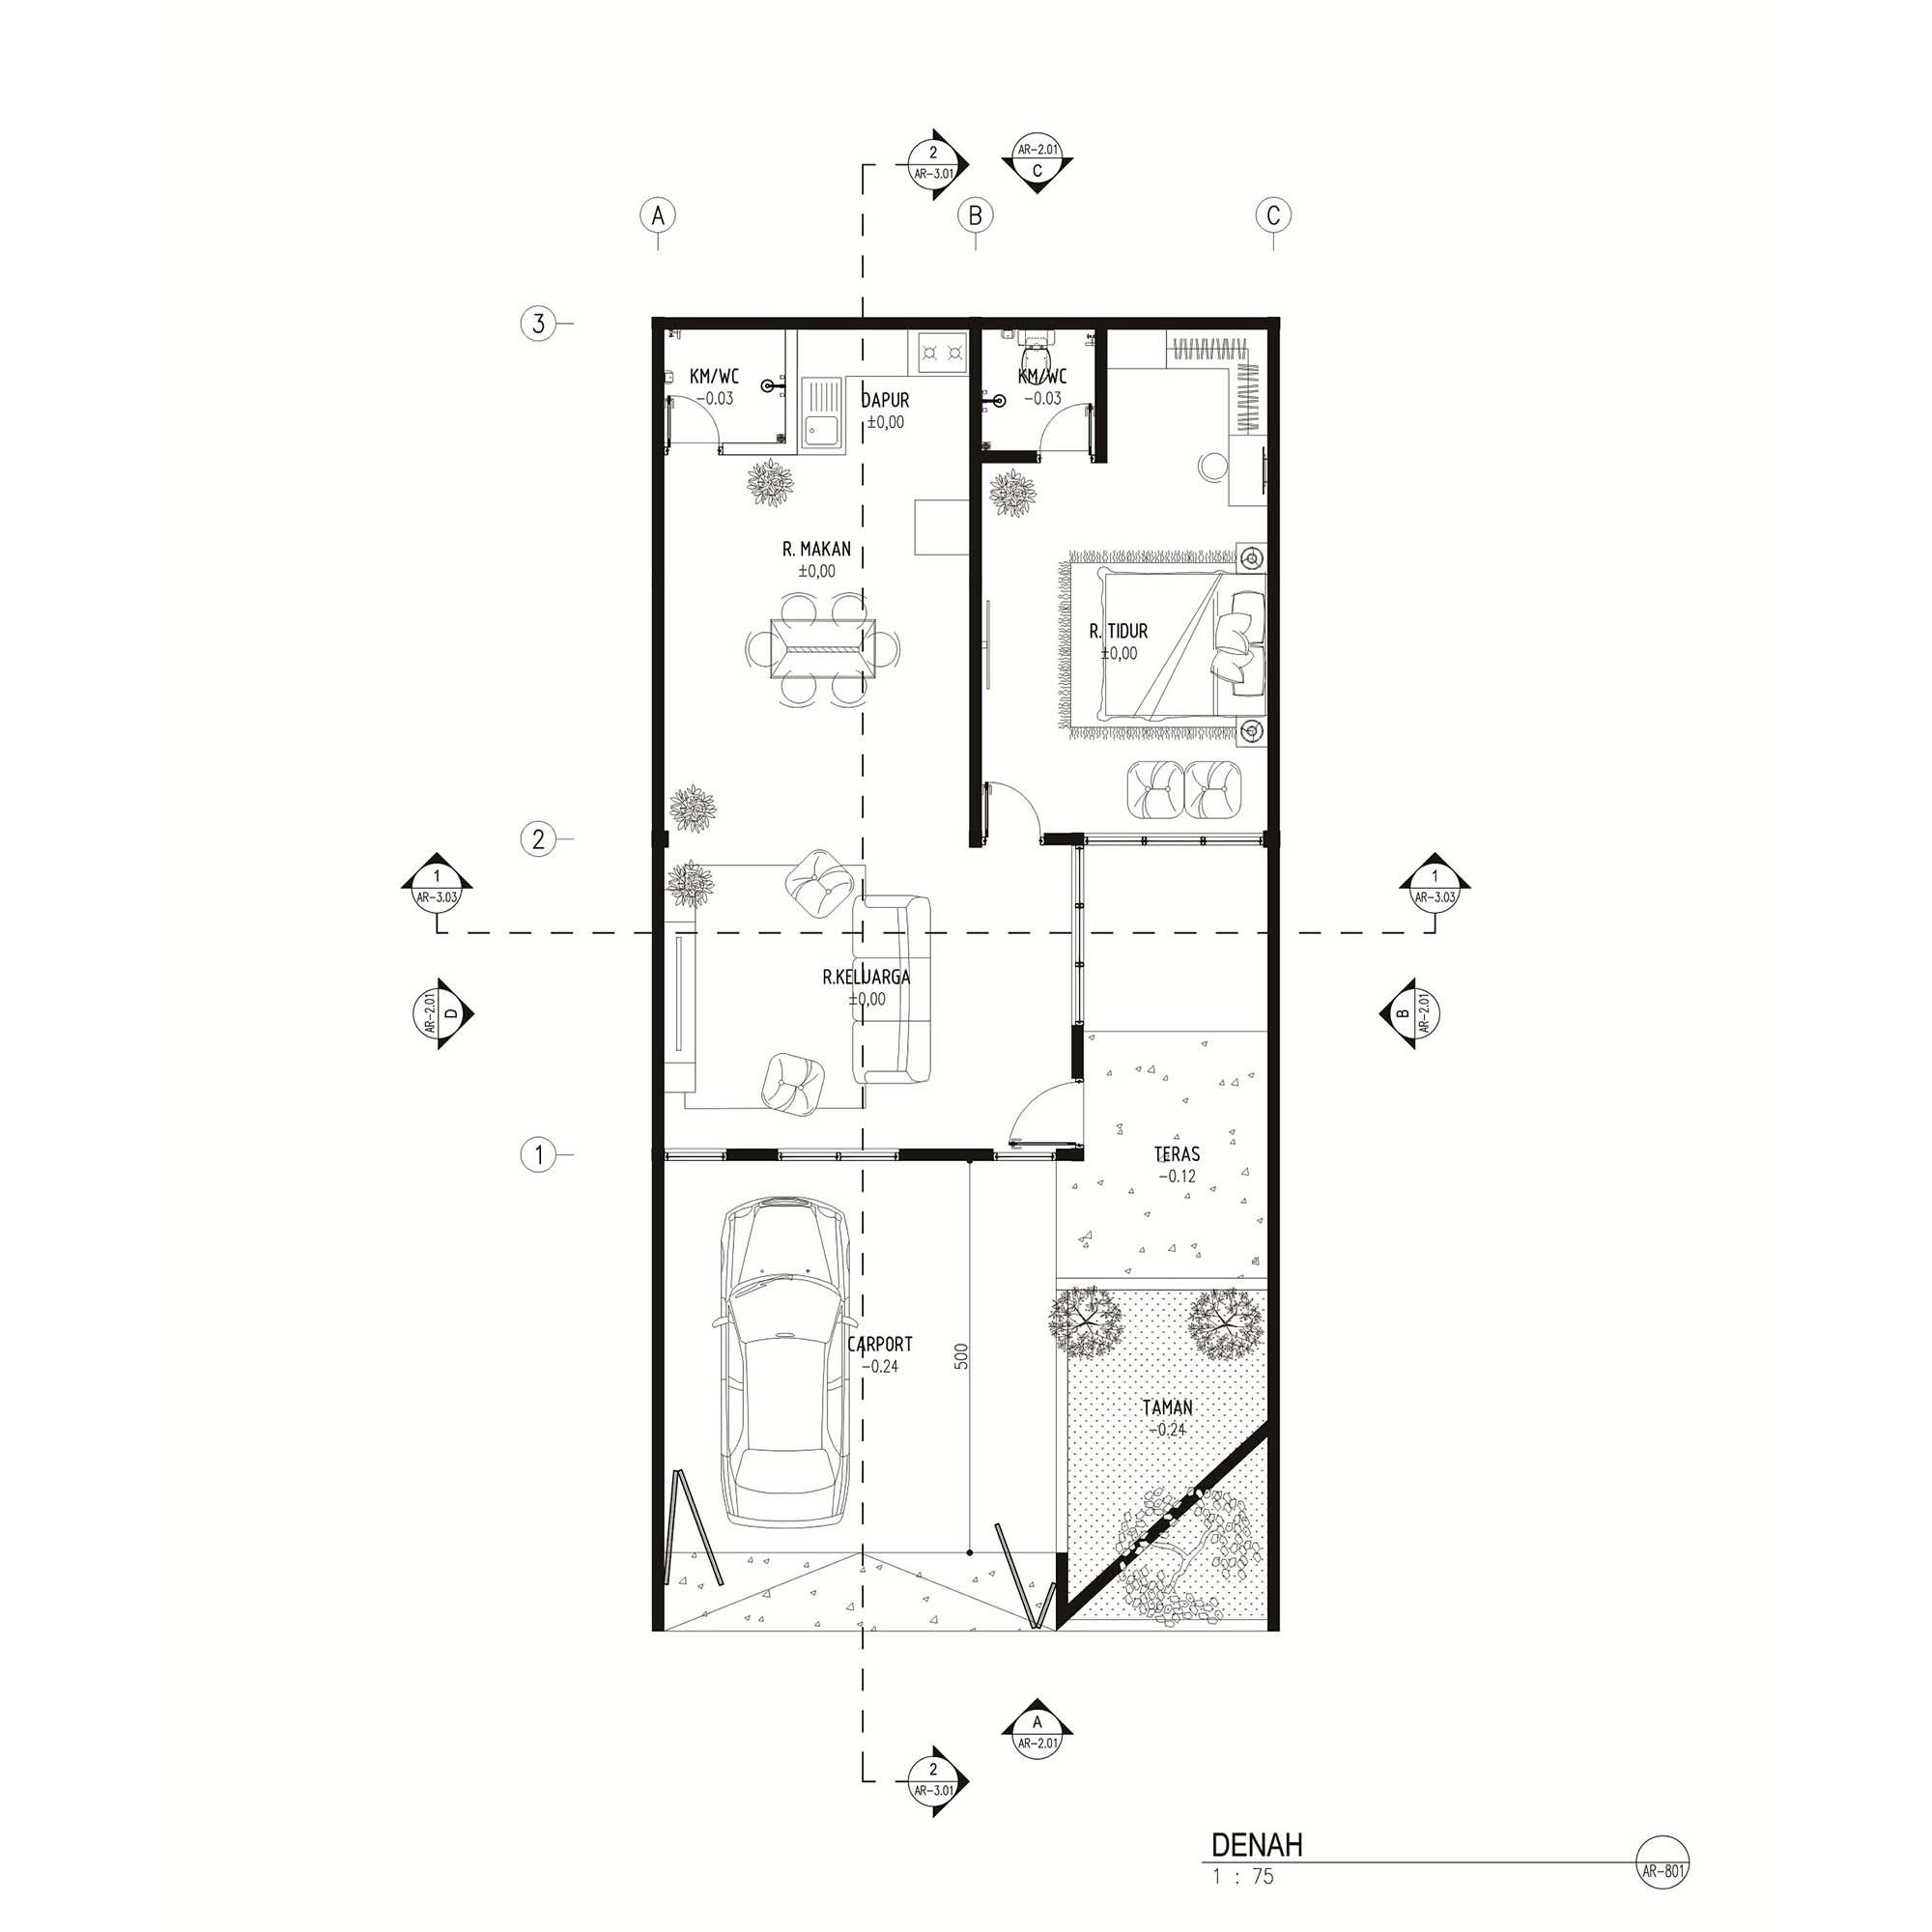 GY HOUSE (2)